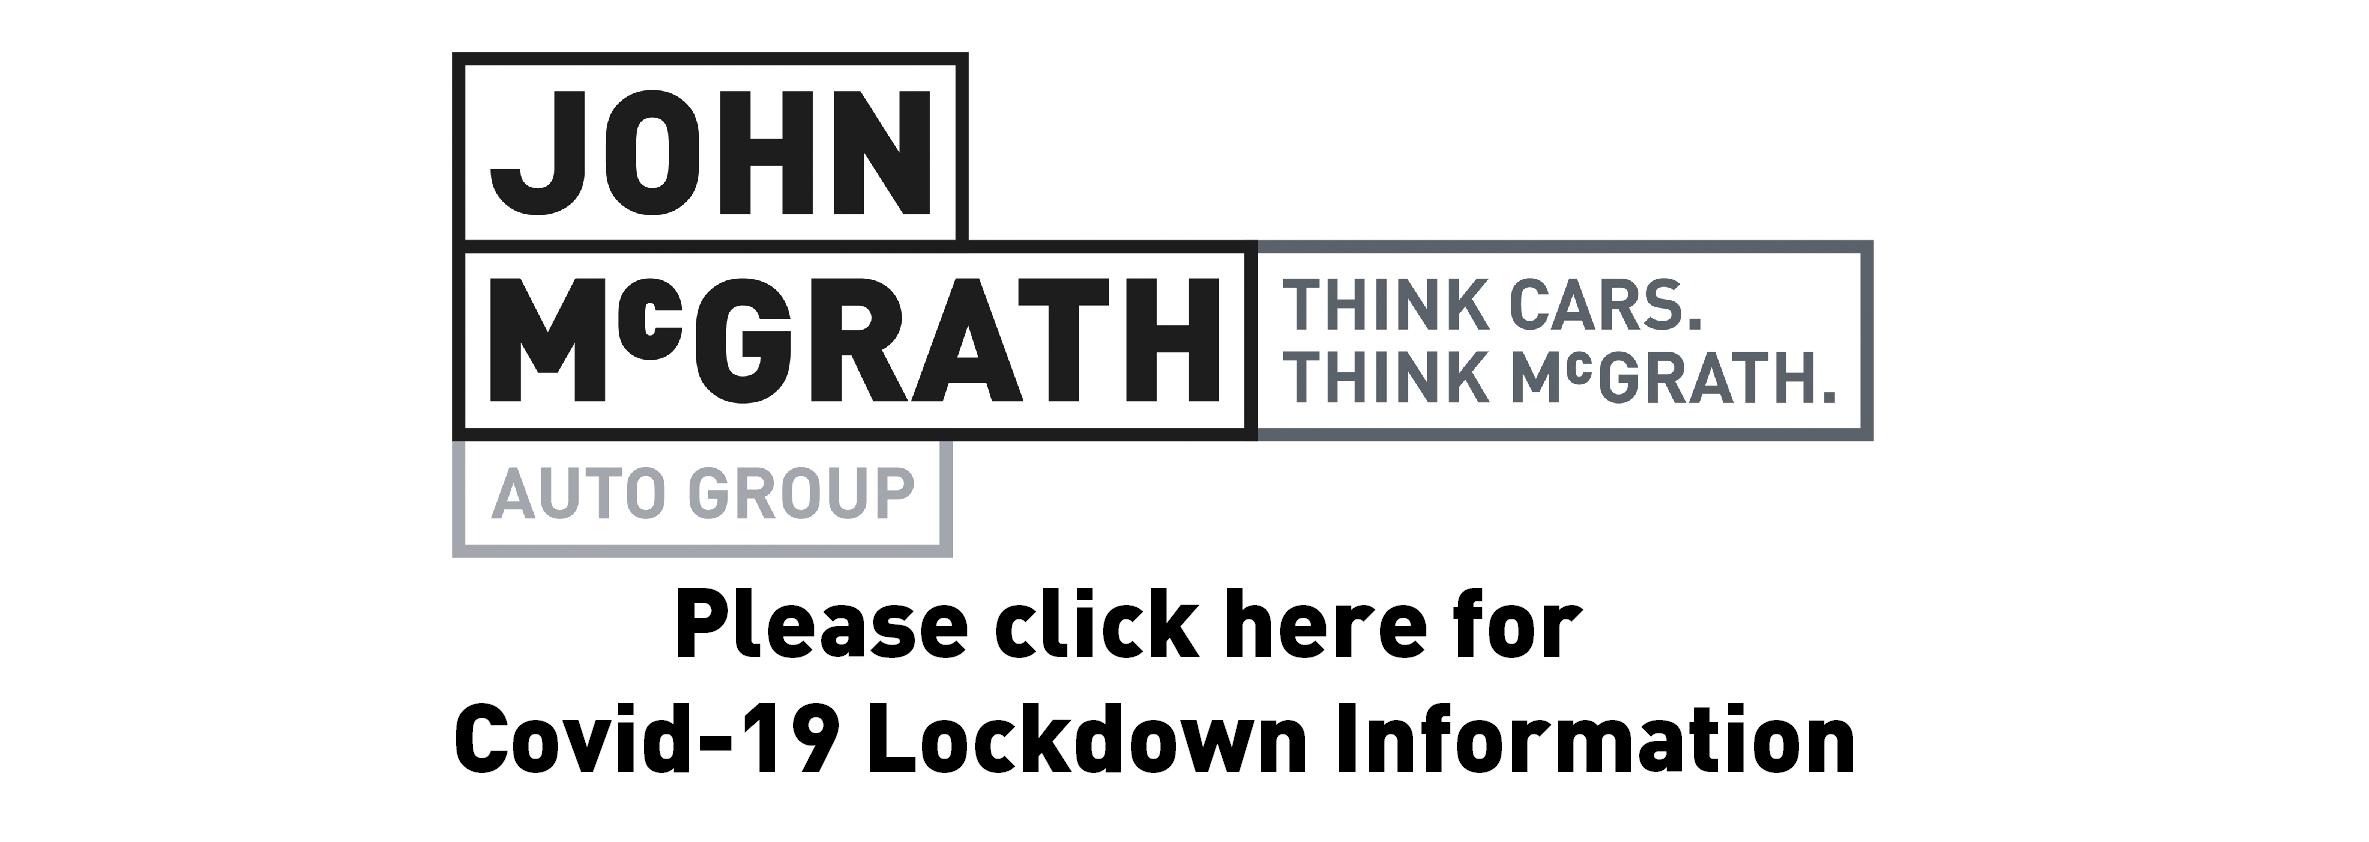 Covid Lockdown Link